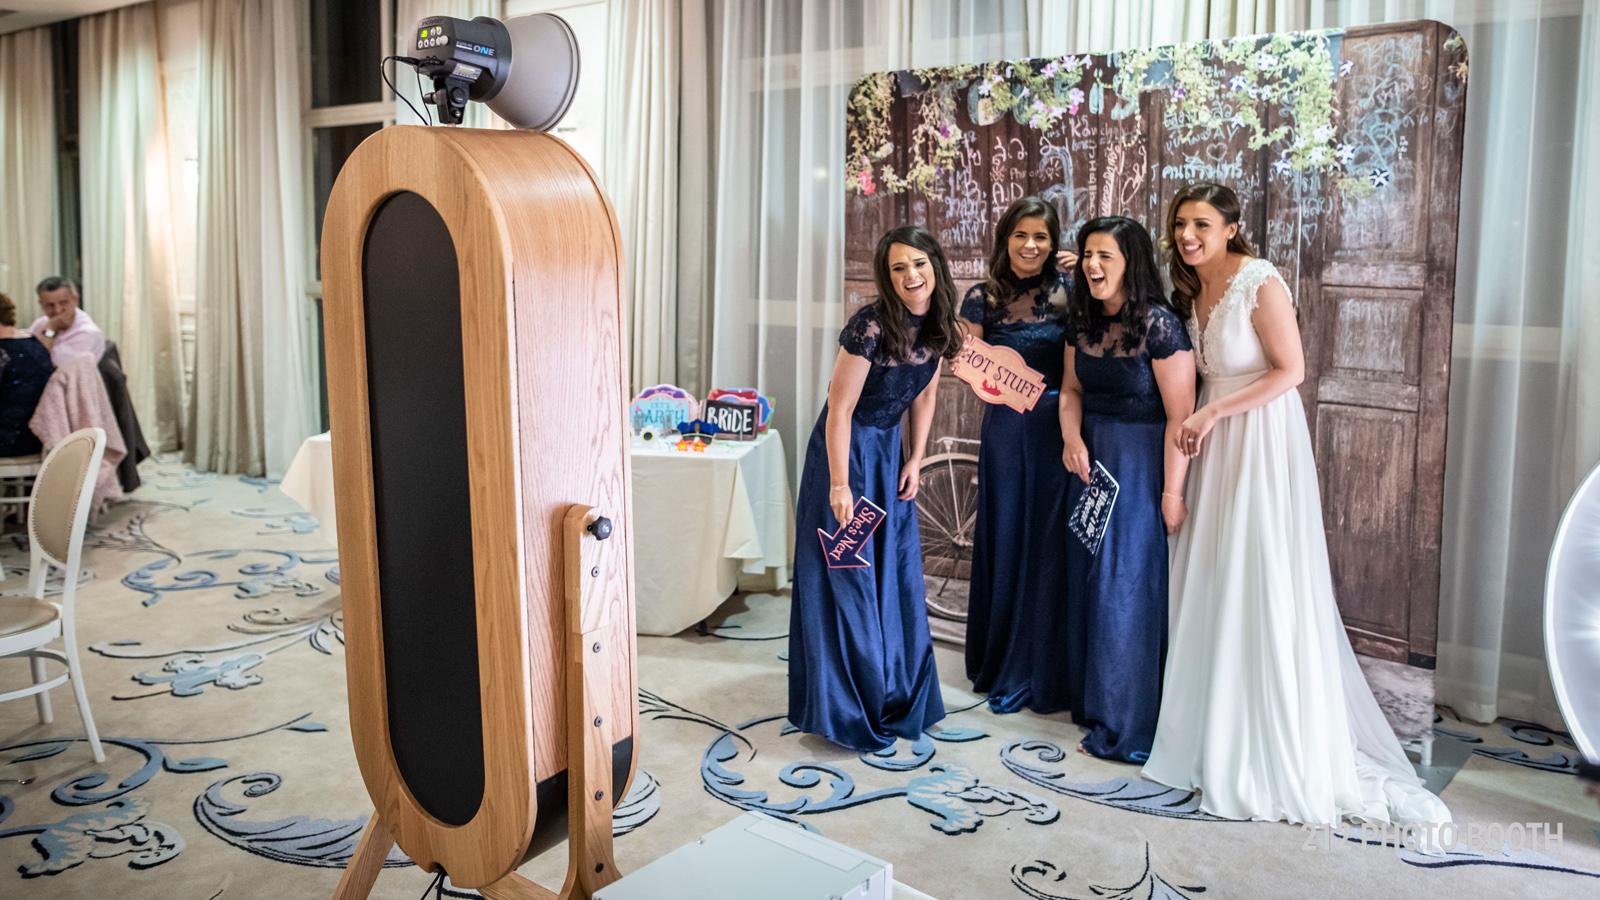 Retro Magic Mirror Photo Booth for Wedding